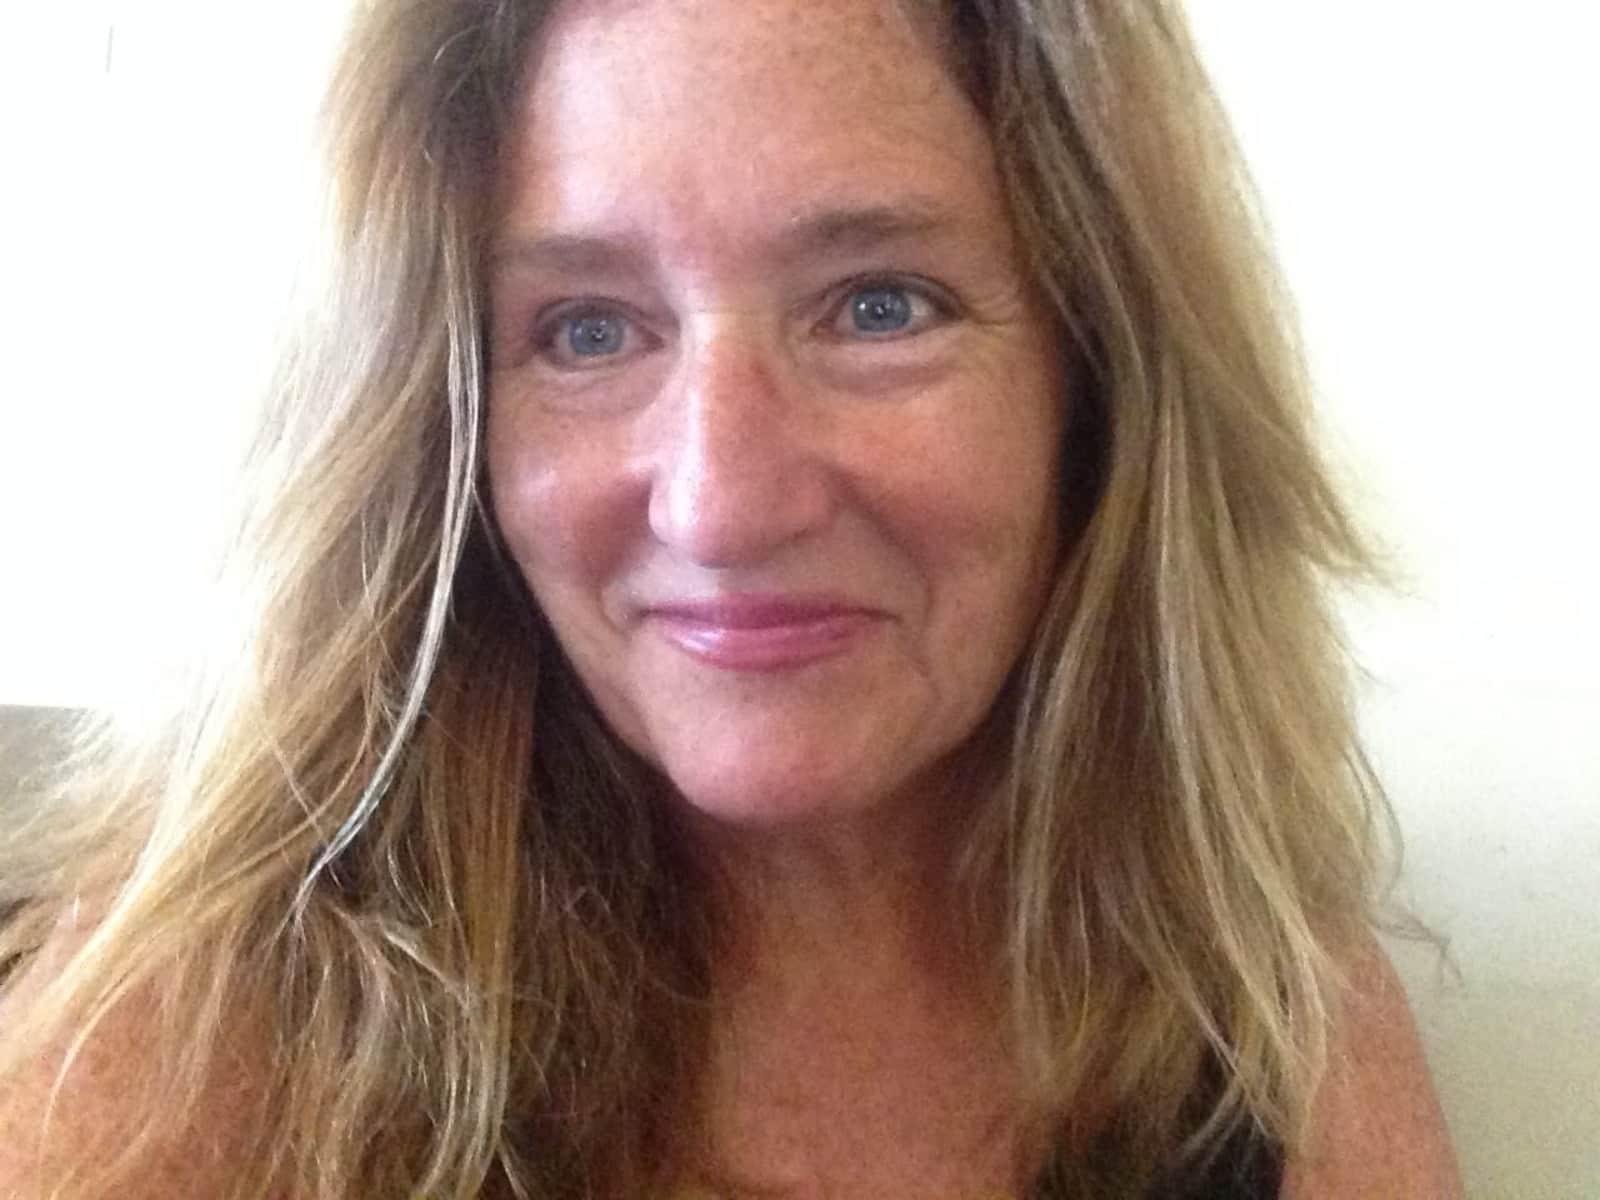 Jodie from Seattle, Washington, United States